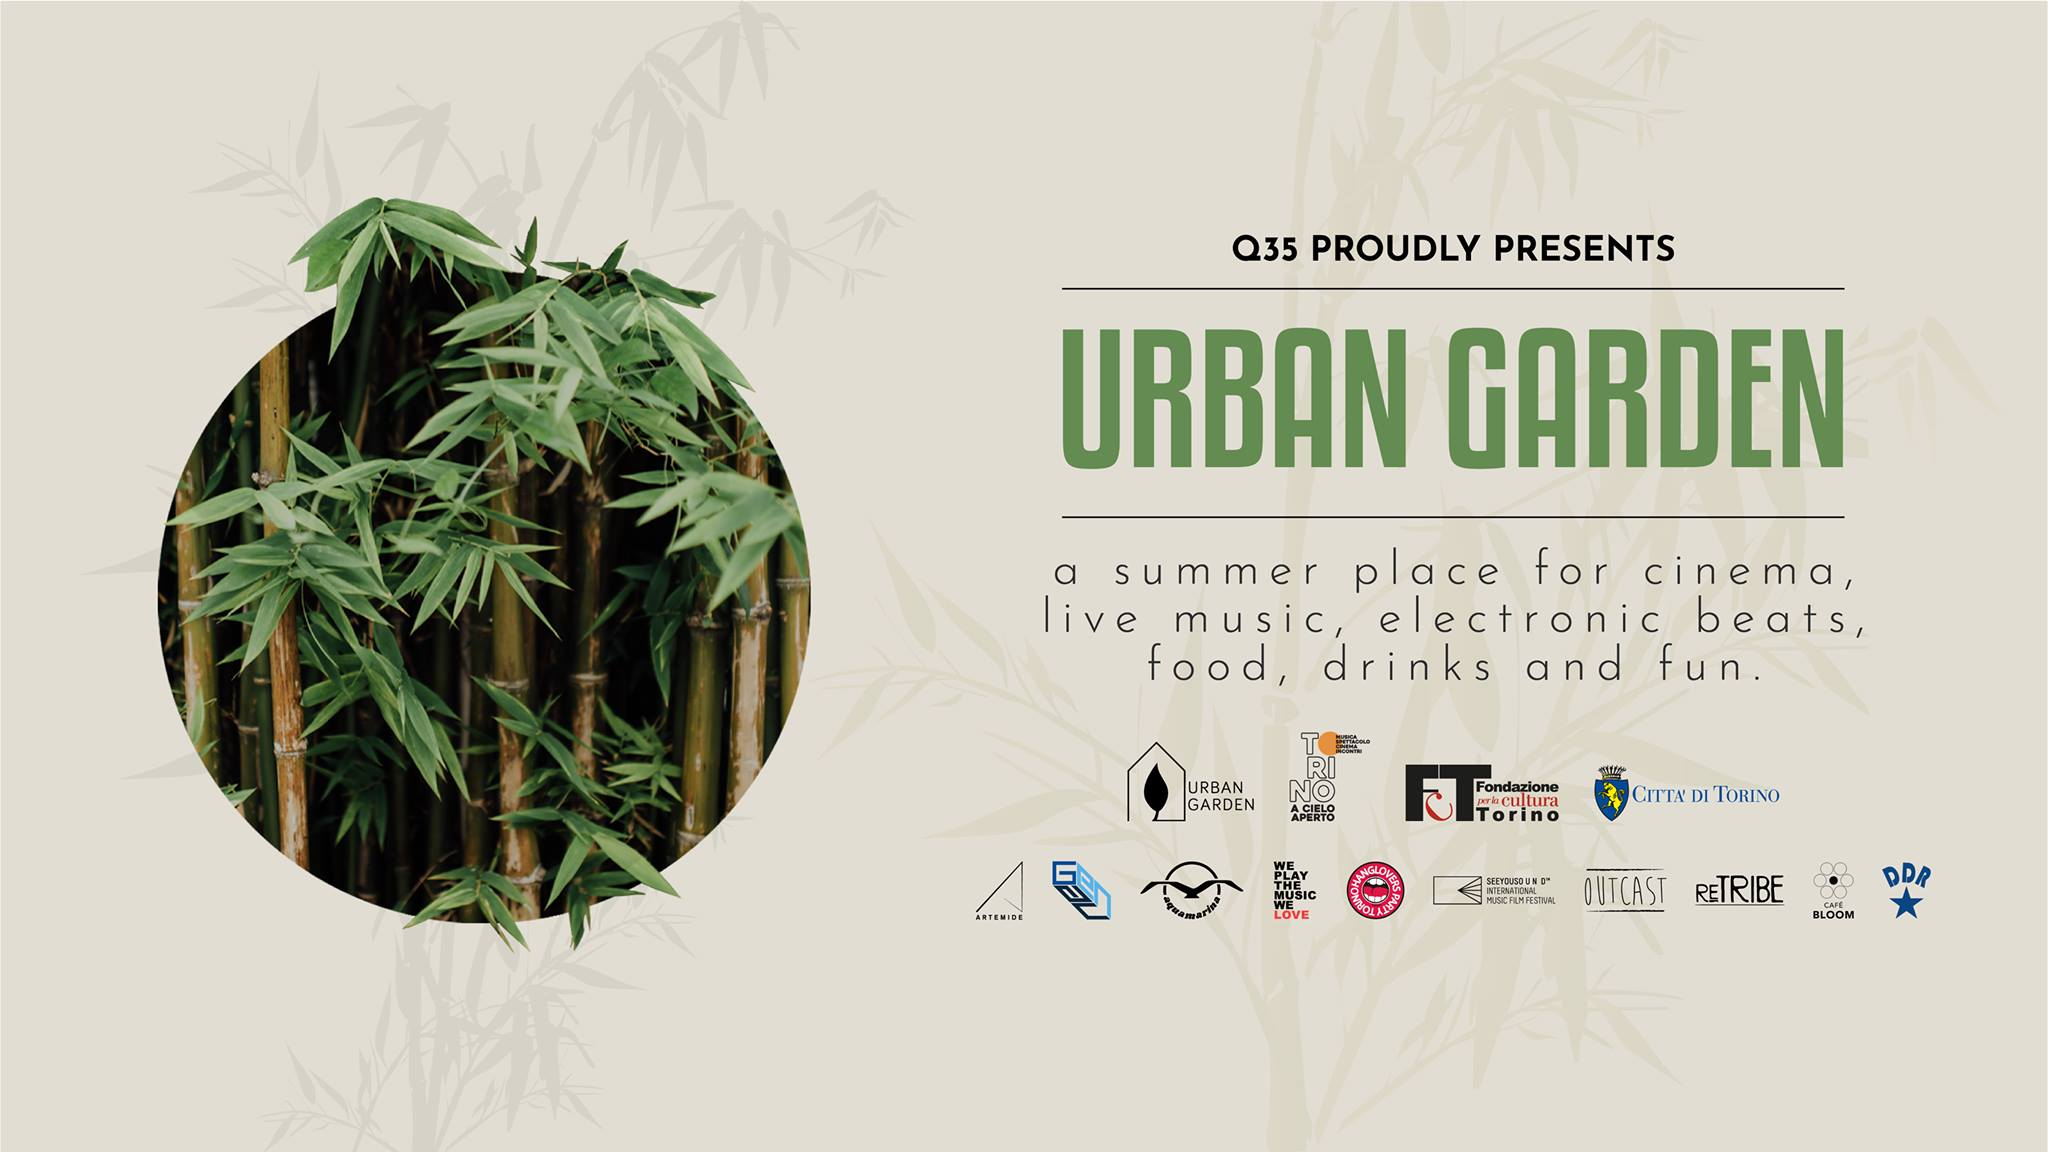 Urban Garden al Q35